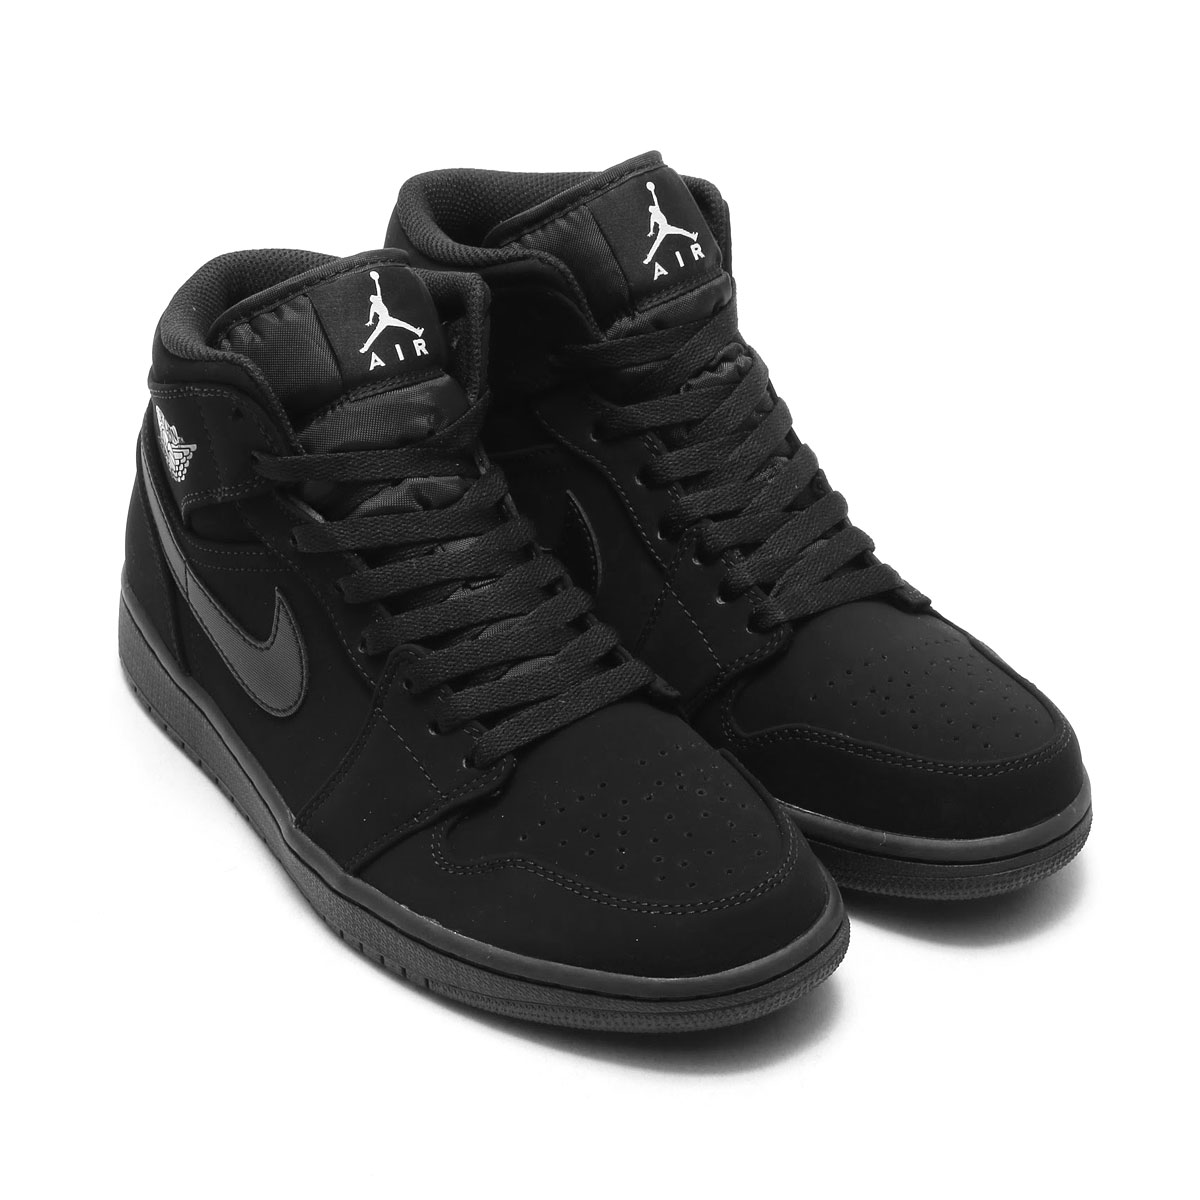 atmos pink  NIKE AIR JORDAN 1 MID (Nike Air Jordan 1 mid) (BLACK WHITE-BLACK)  17FA-I  b905c73040d8